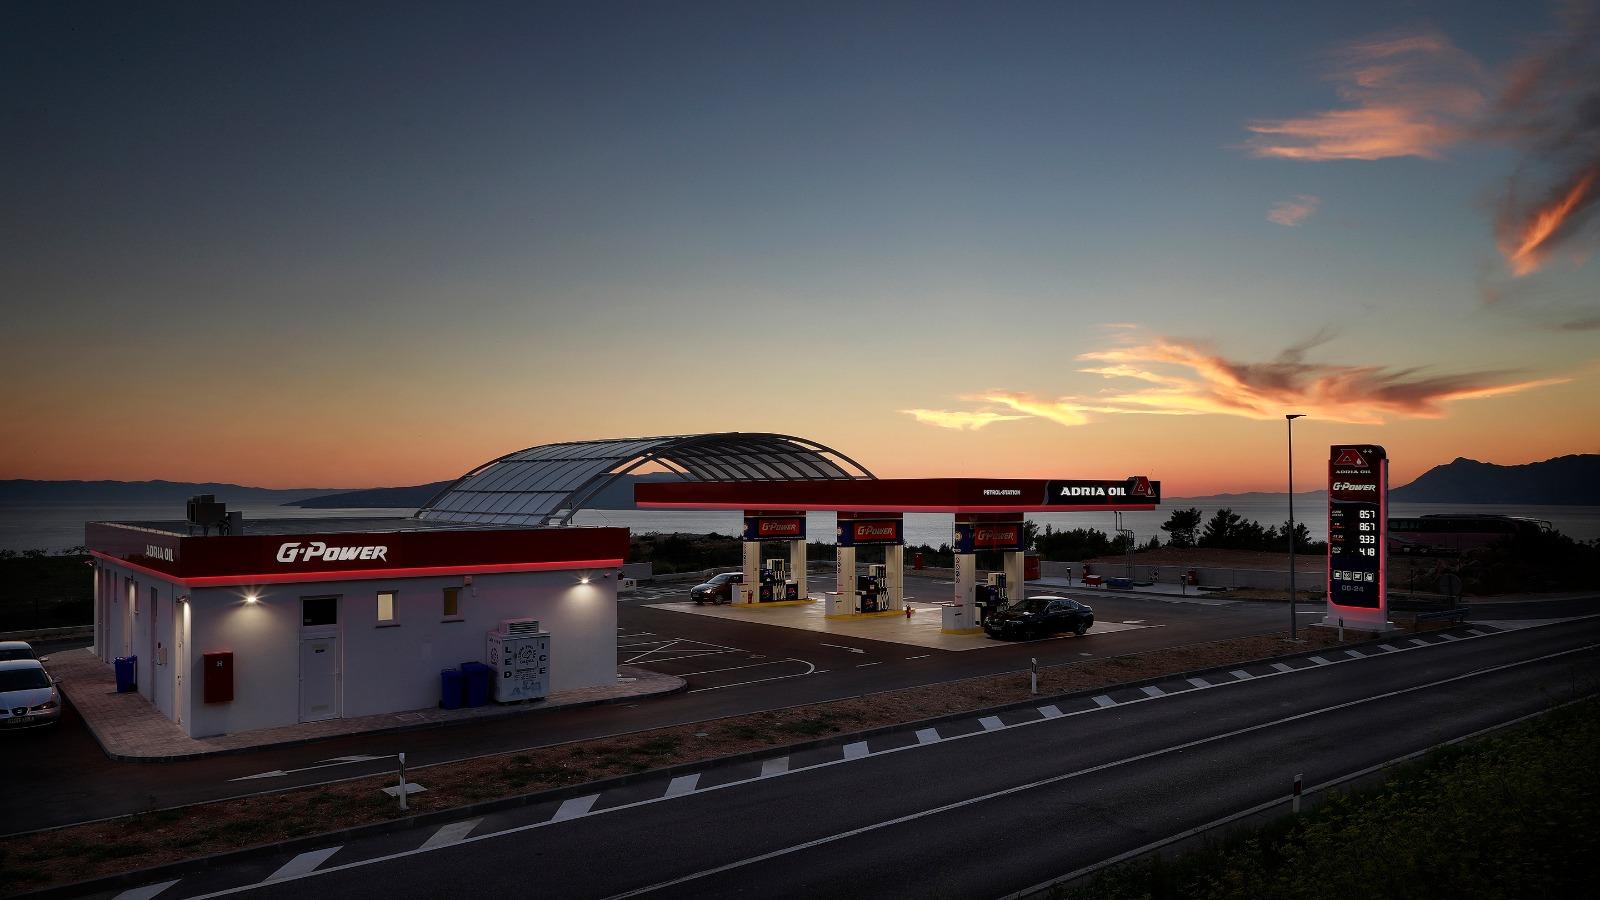 Nova Adria oil beznisnka postaja u Makarskoj